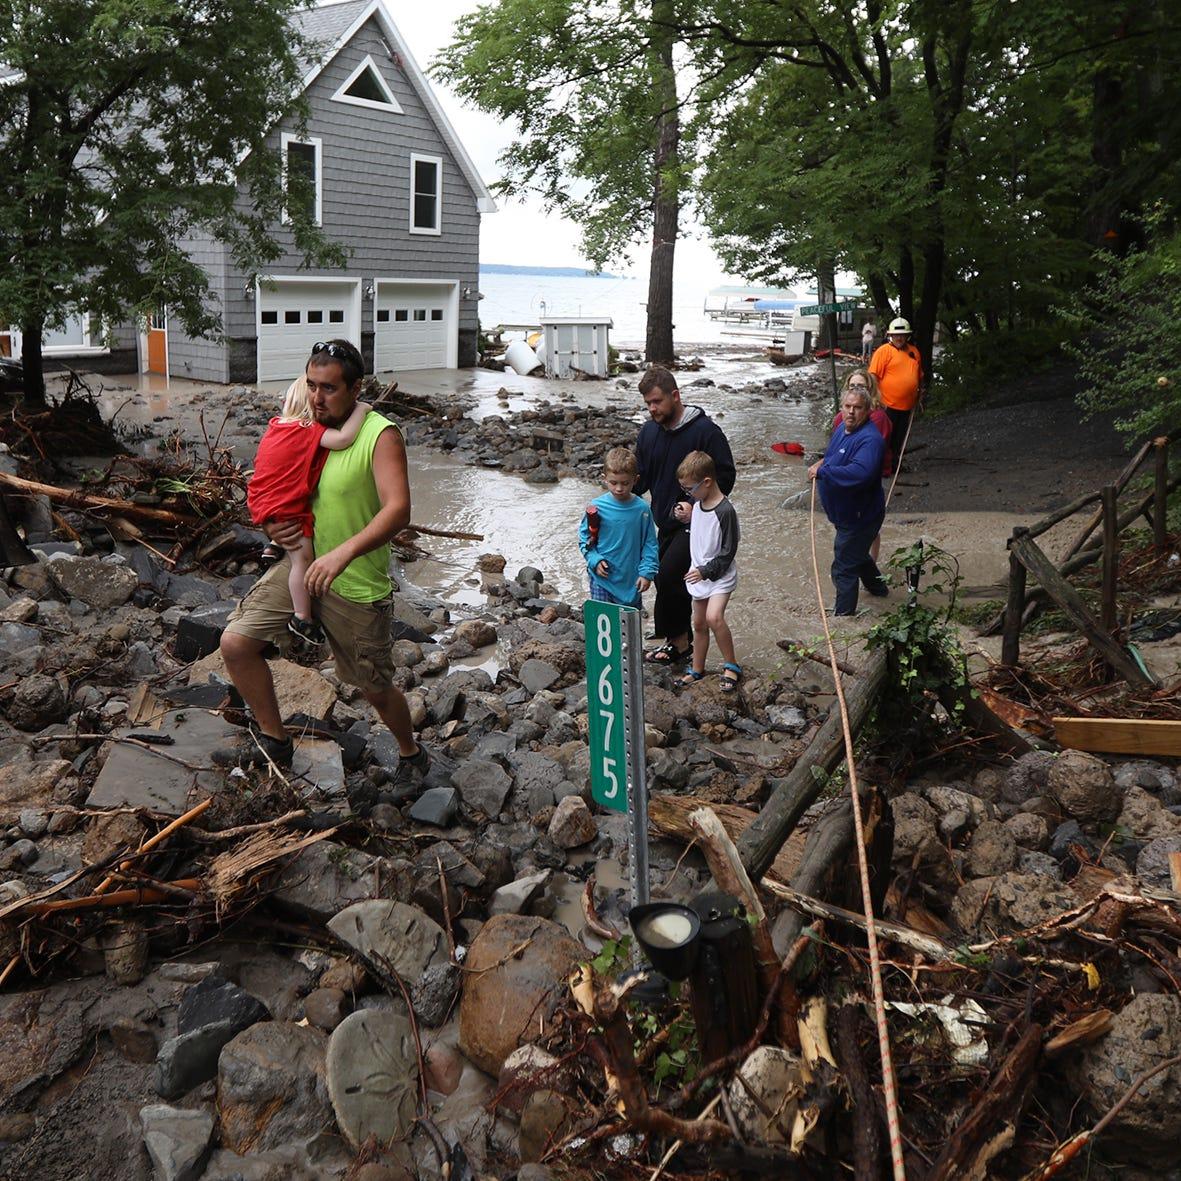 Amid widespread flooding, Seneca Lake fares the worst